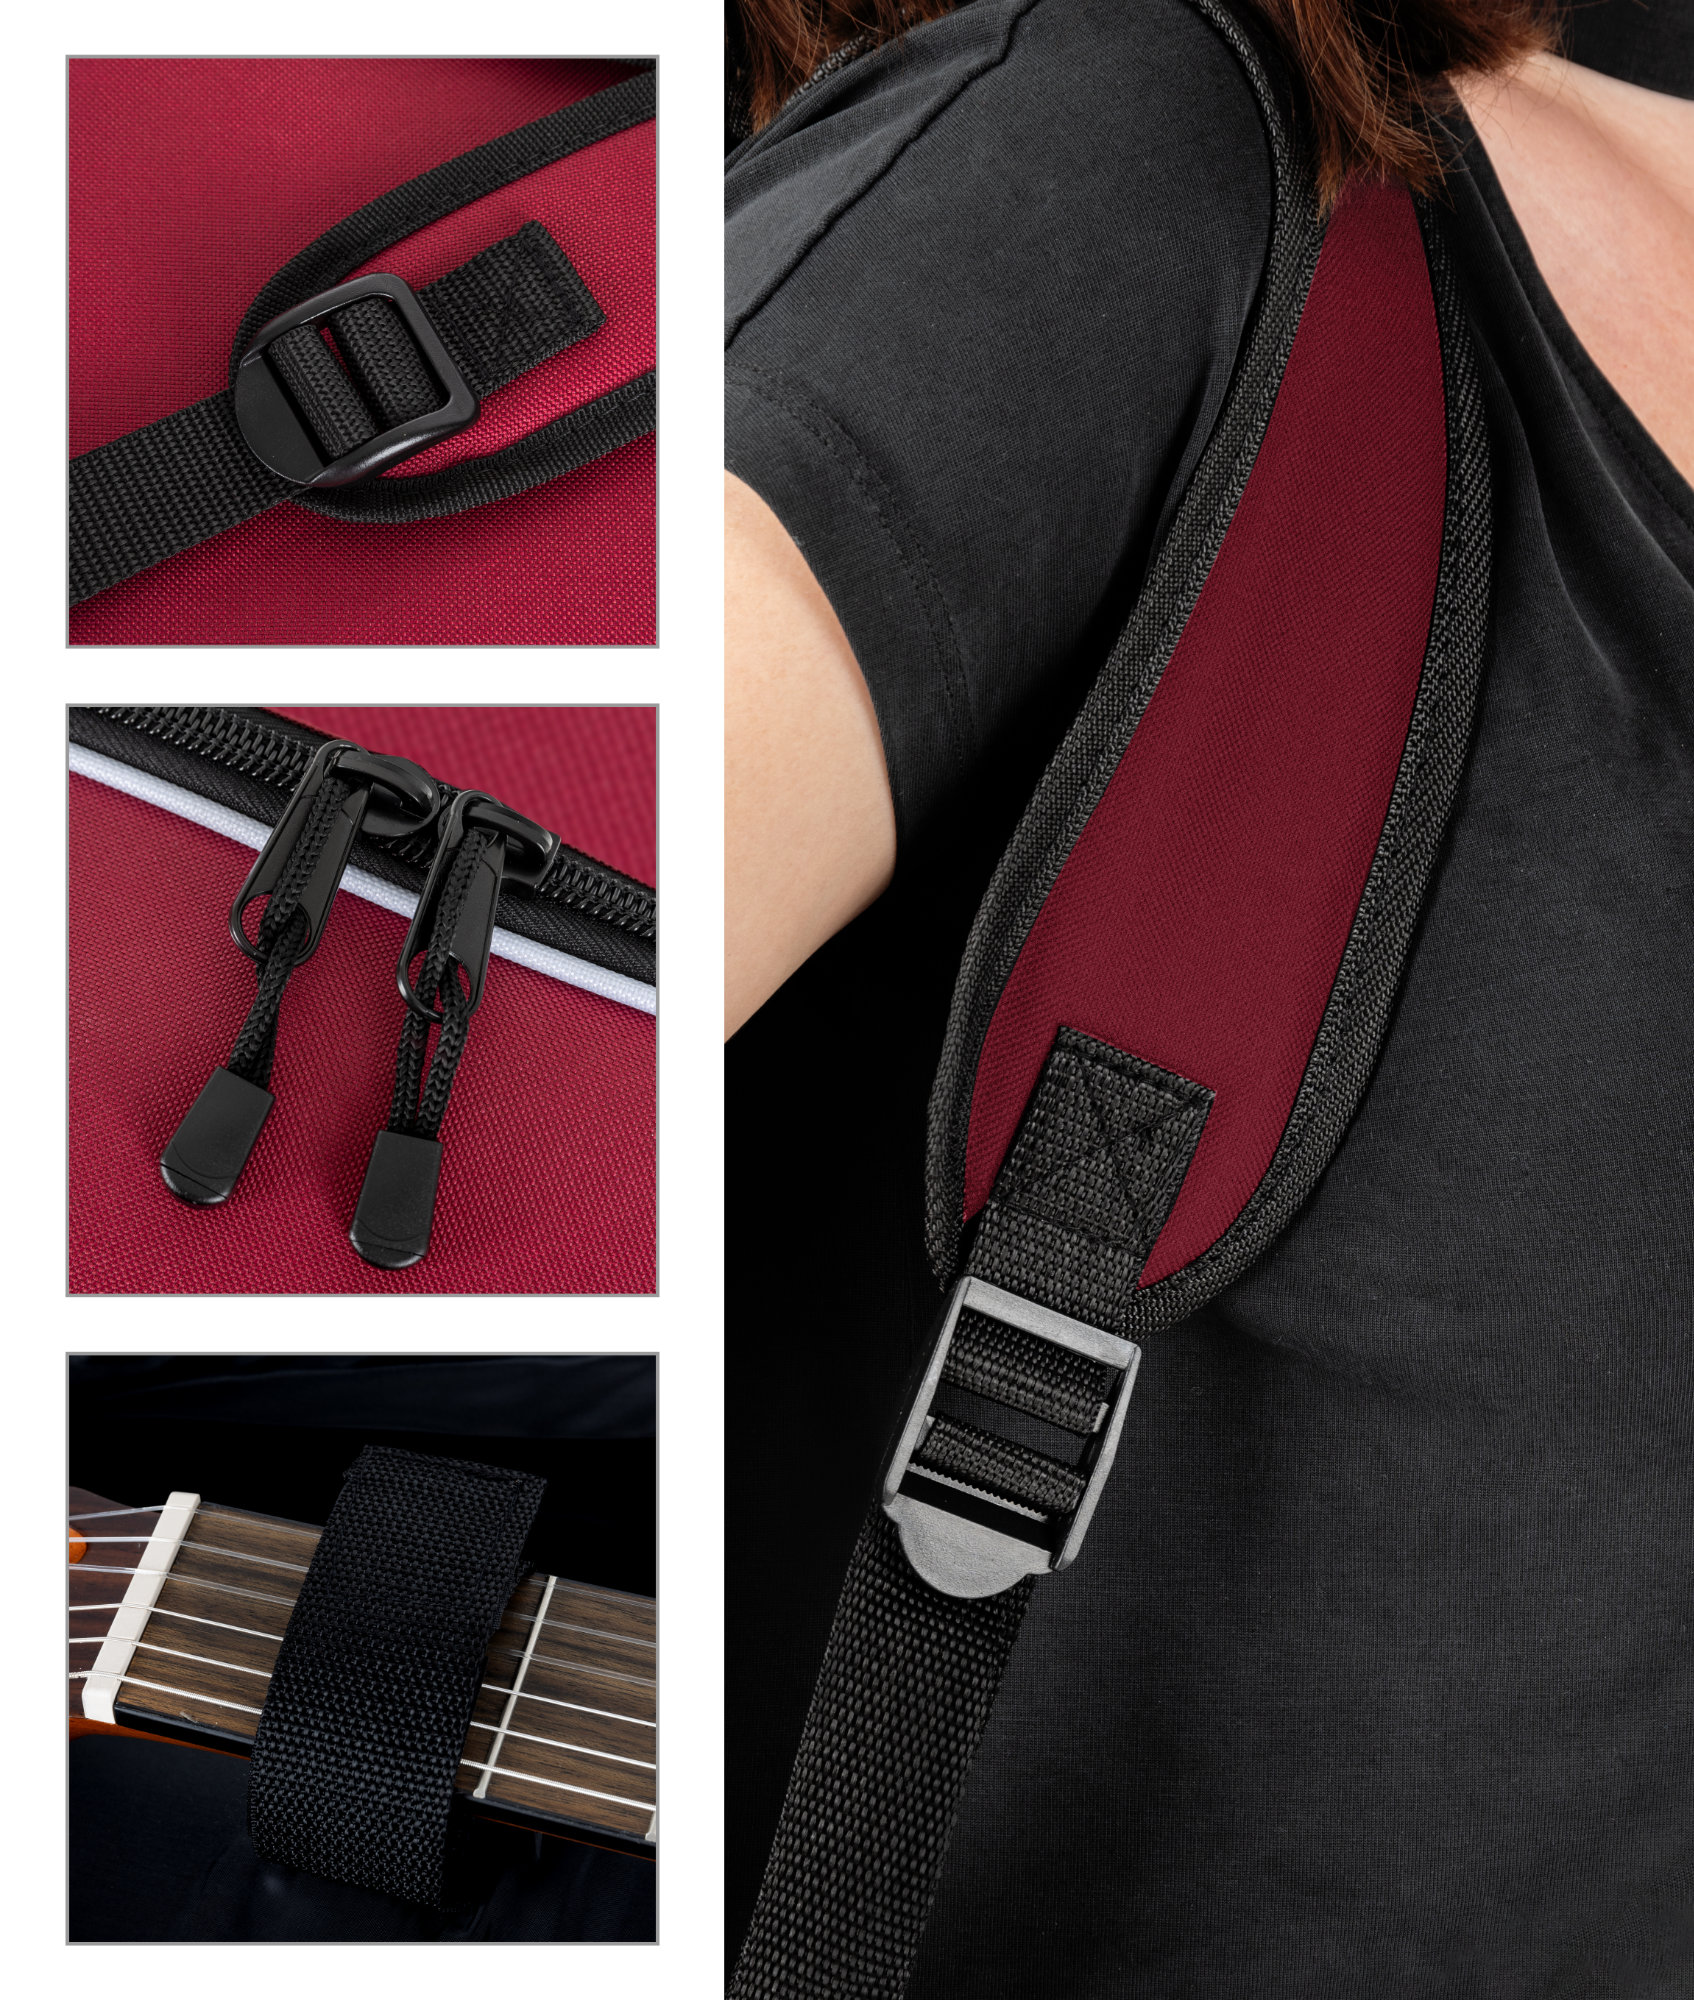 Housse etui sac guitare classique acoustique rembourre for Housse guitare acoustique